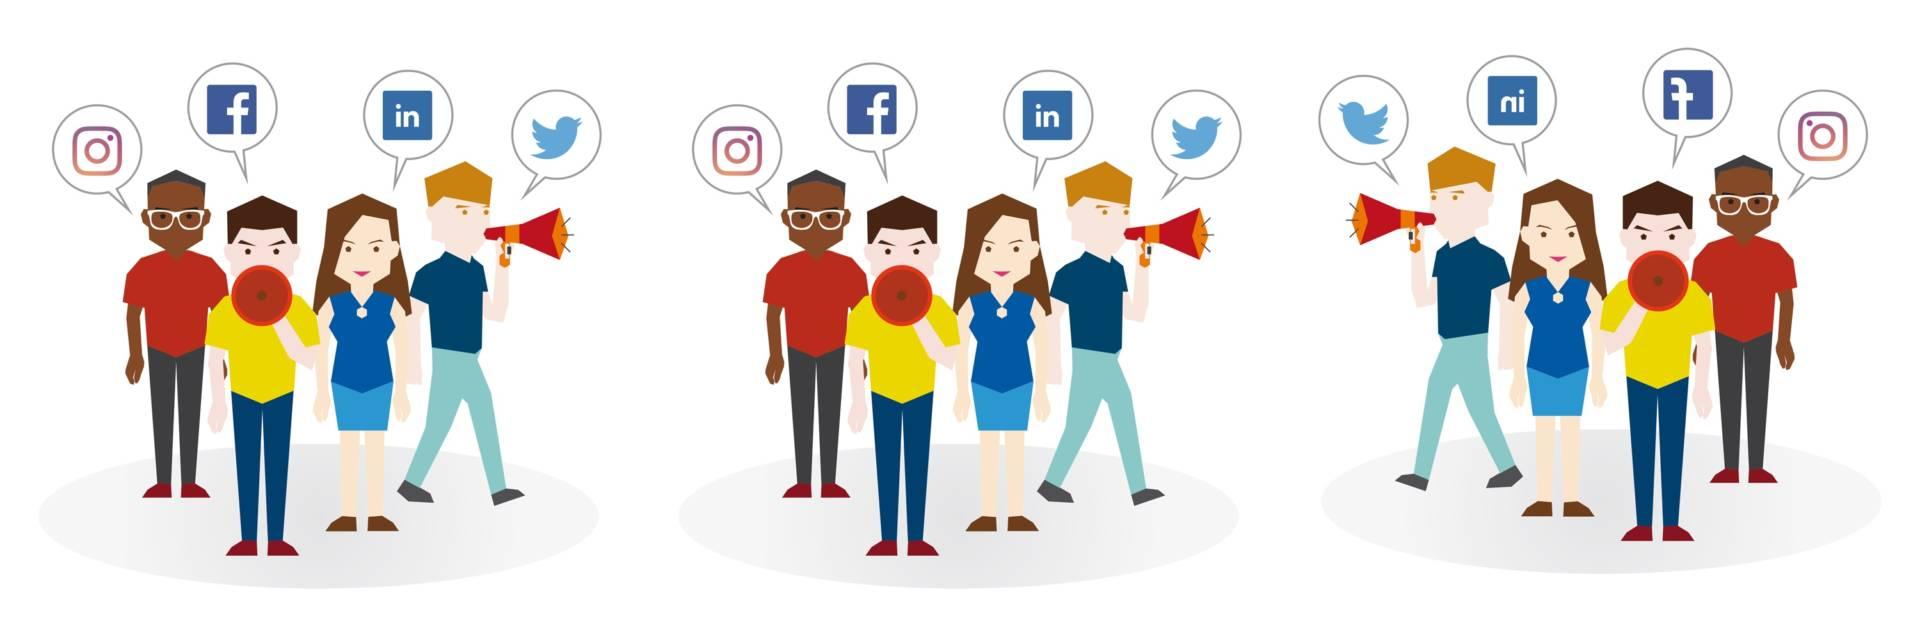 Il carattere di chi frequenta i social: da Instagram a Twitter by Rudy Bandiera